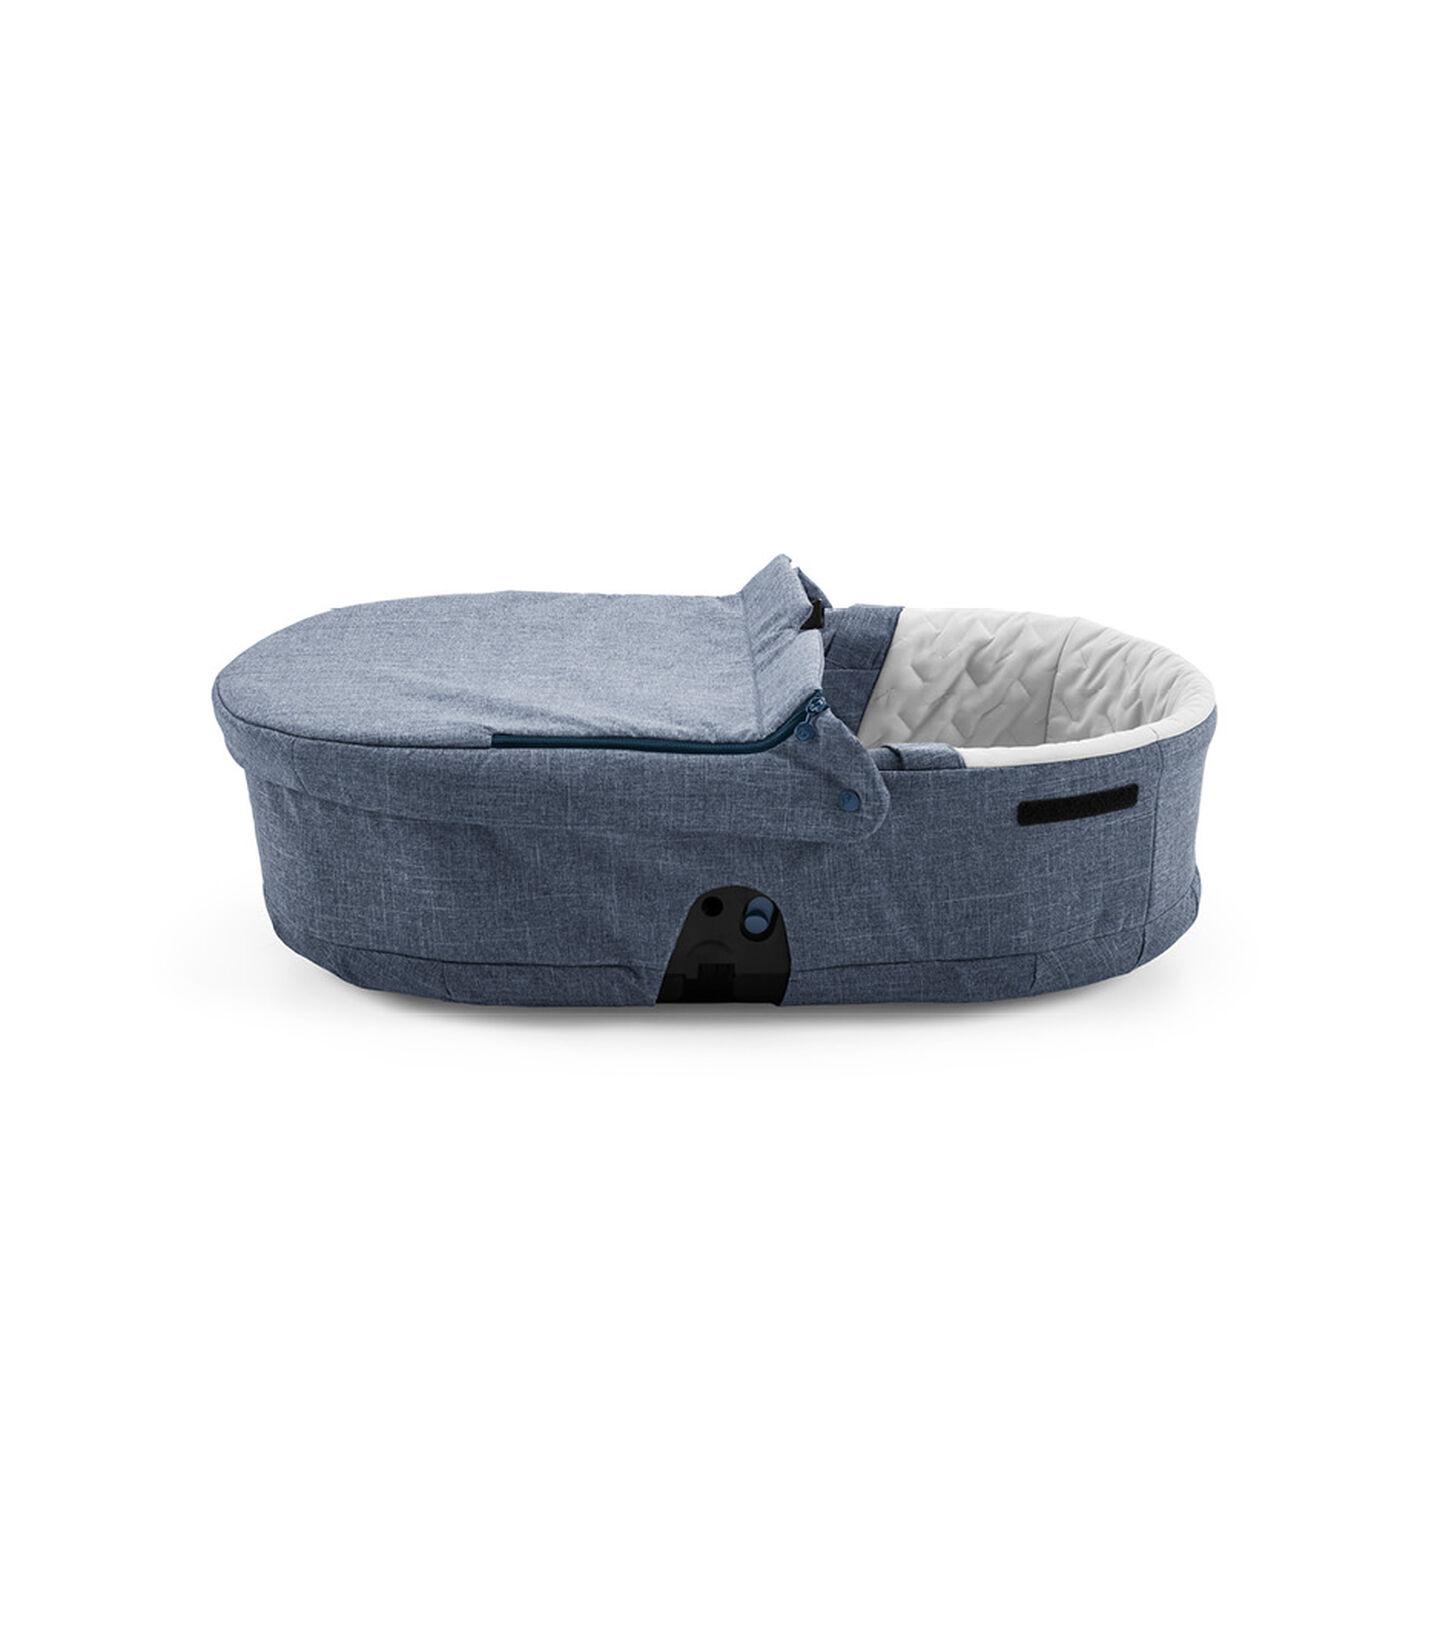 Stokke® Beat Carry Cot Blue Melange, Blue Melange, mainview view 2